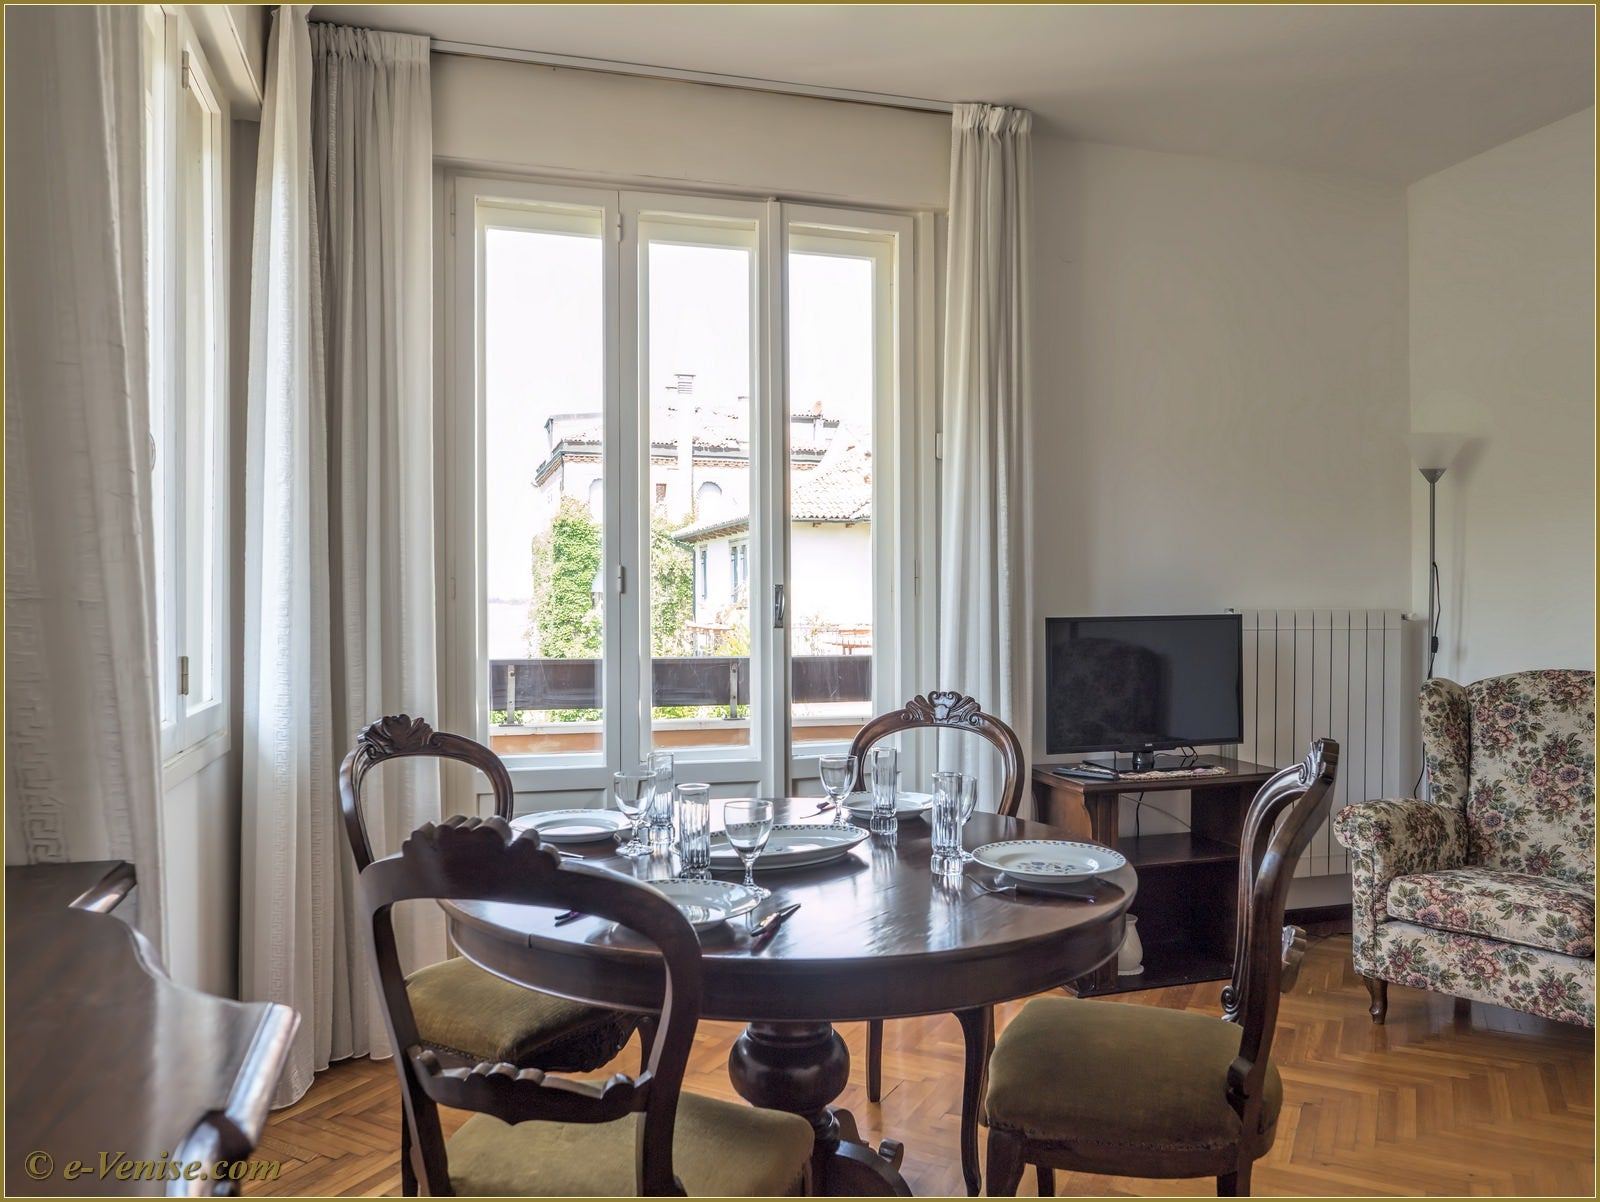 Location appartement venise lido view 6 personnes 3 for Salle a manger 7m2